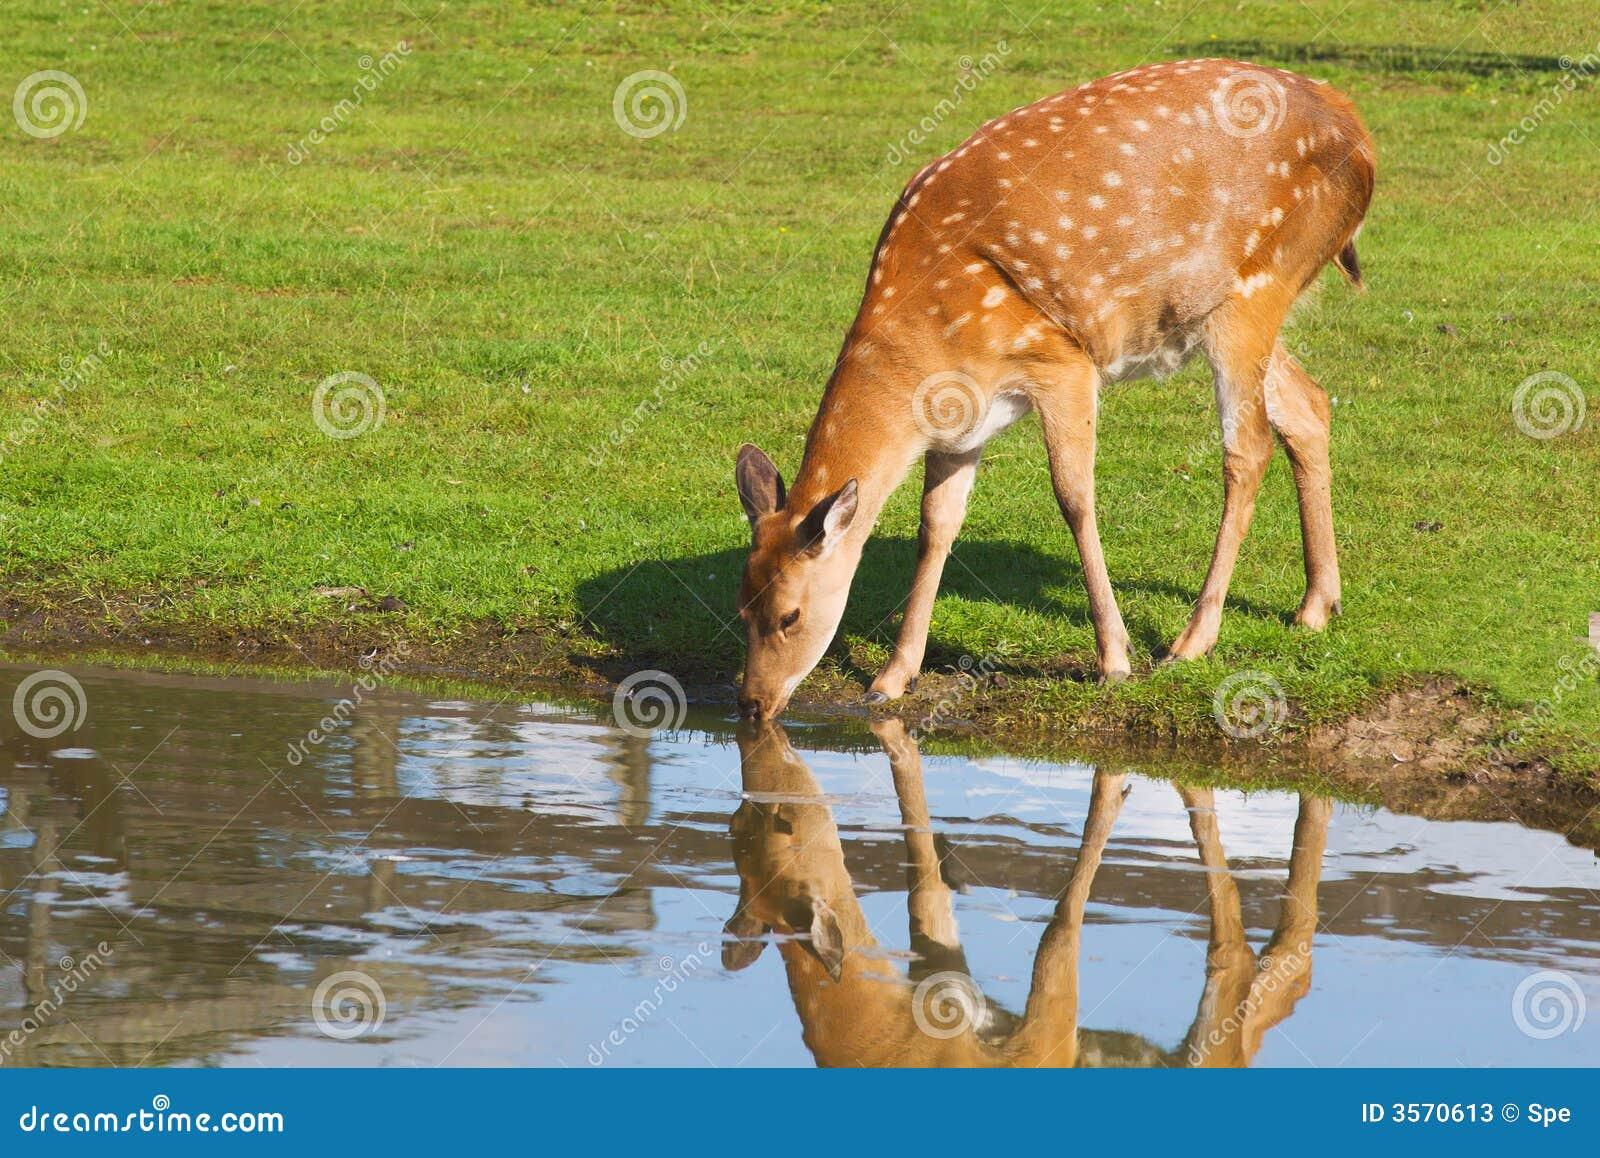 Deer Drinking Water Stock Photos Image 3570613